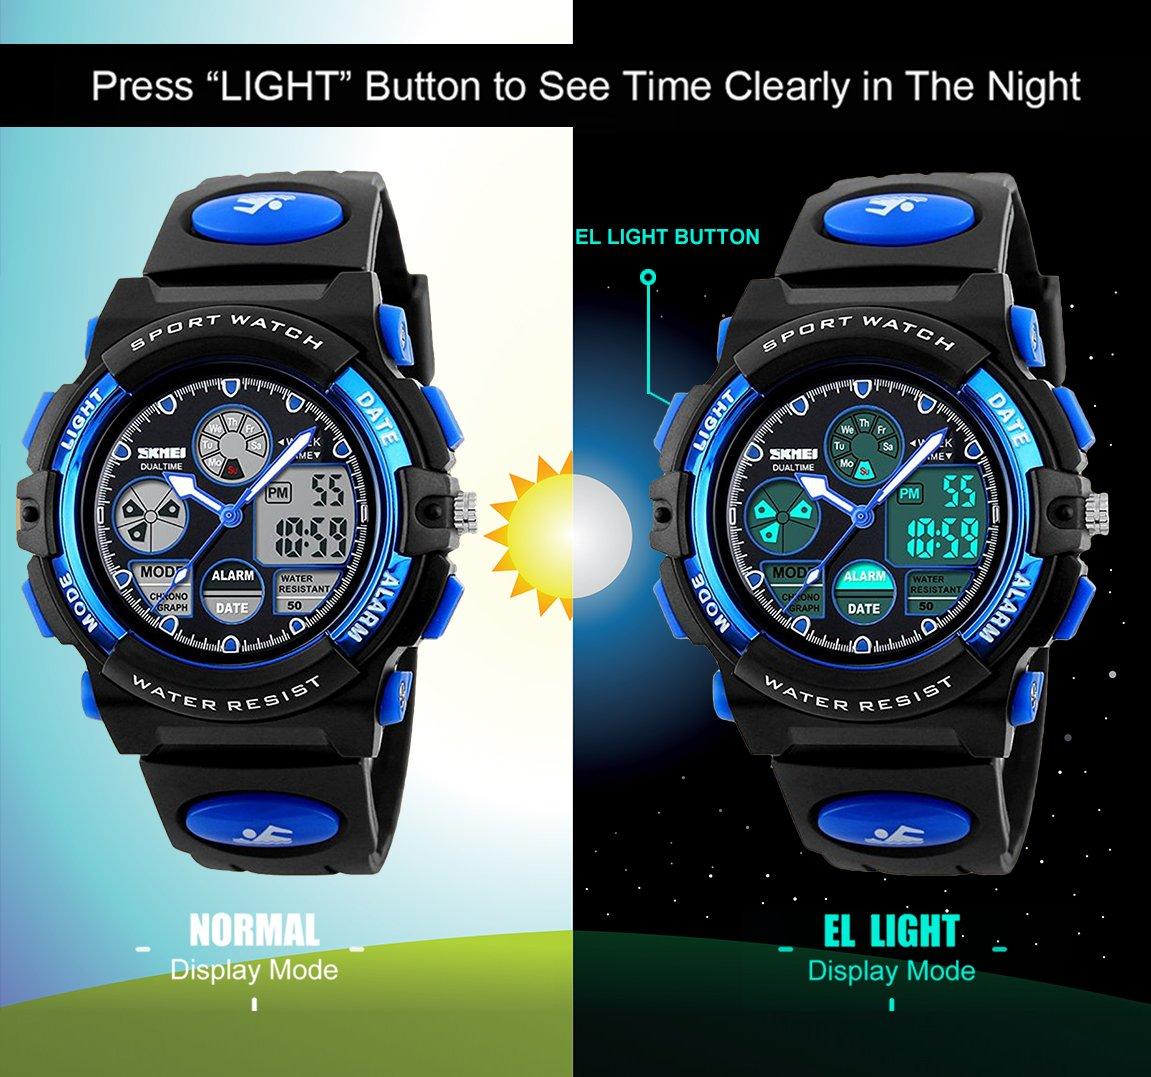 Kids Digital analógico relojes para niños - Childrens deportes al aire libre reloj con alarma/hora Dual/LED luz, 5 ATM impermeable electrónico analógico Sport muñeca relojes para adolescentes